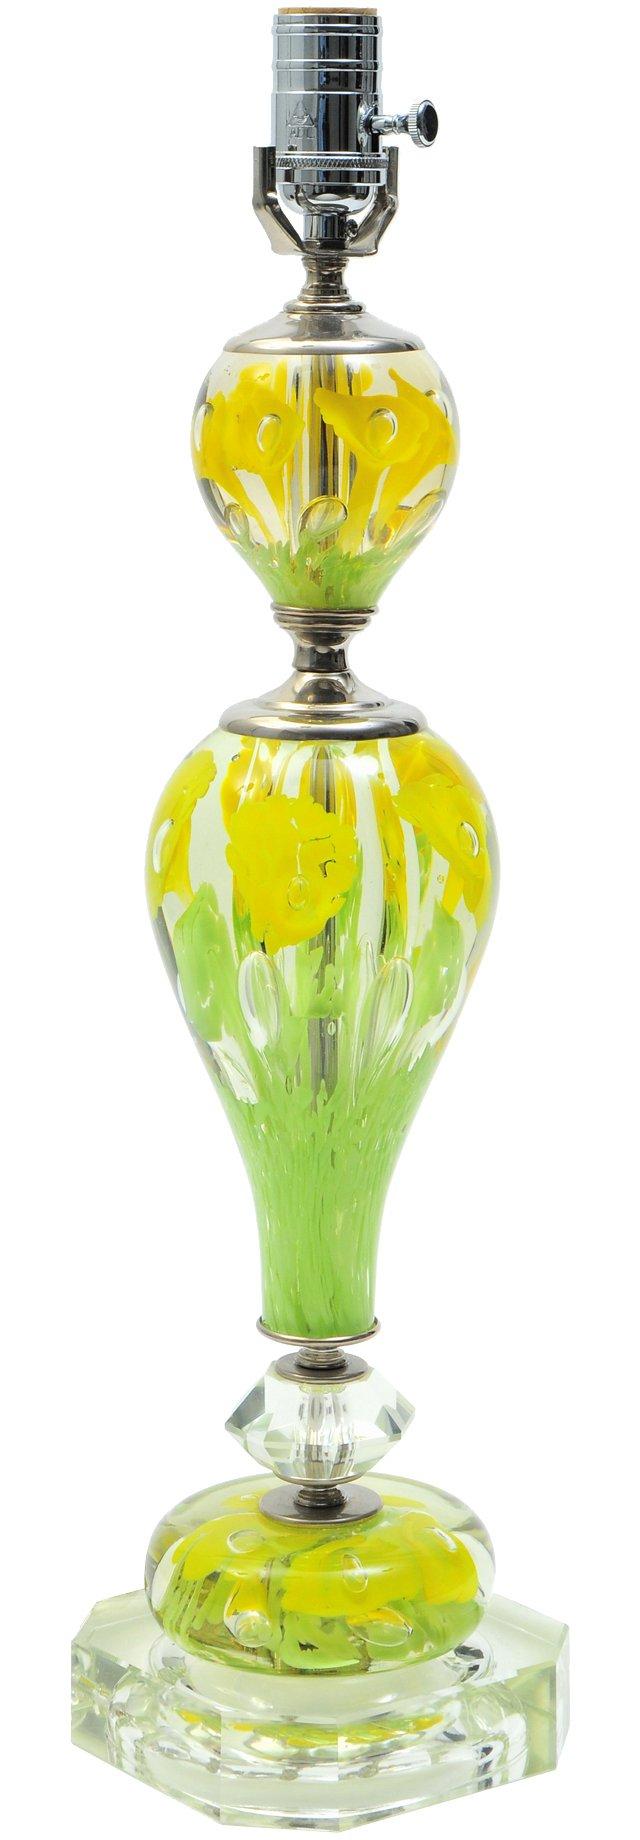 St. Clair Glass Lamp II